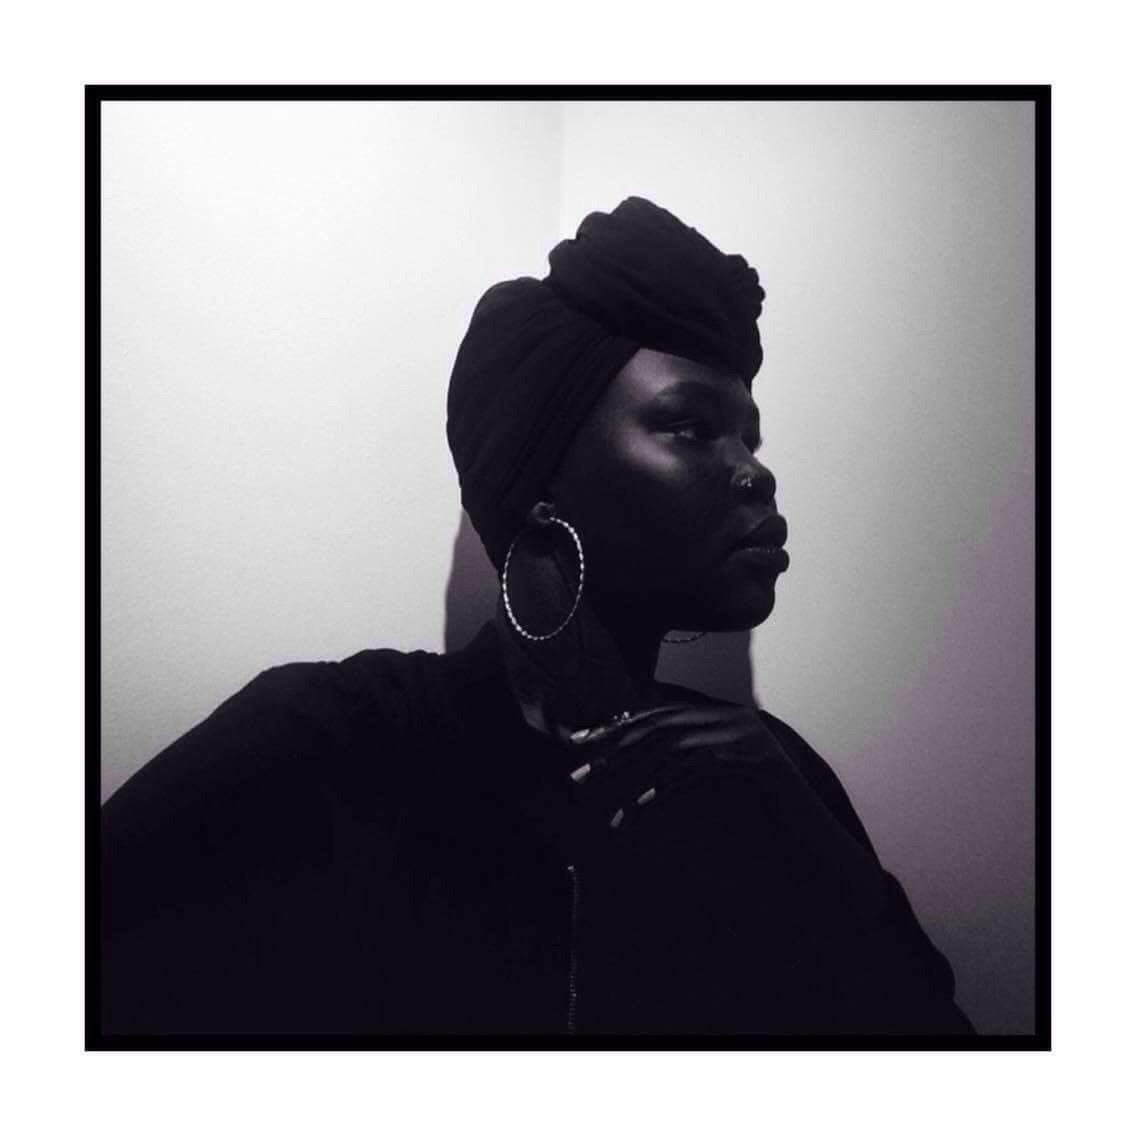 Ruth Nyaruot Ruach - Visual Artist, Writer & Photographer (Brown Skin Girl)